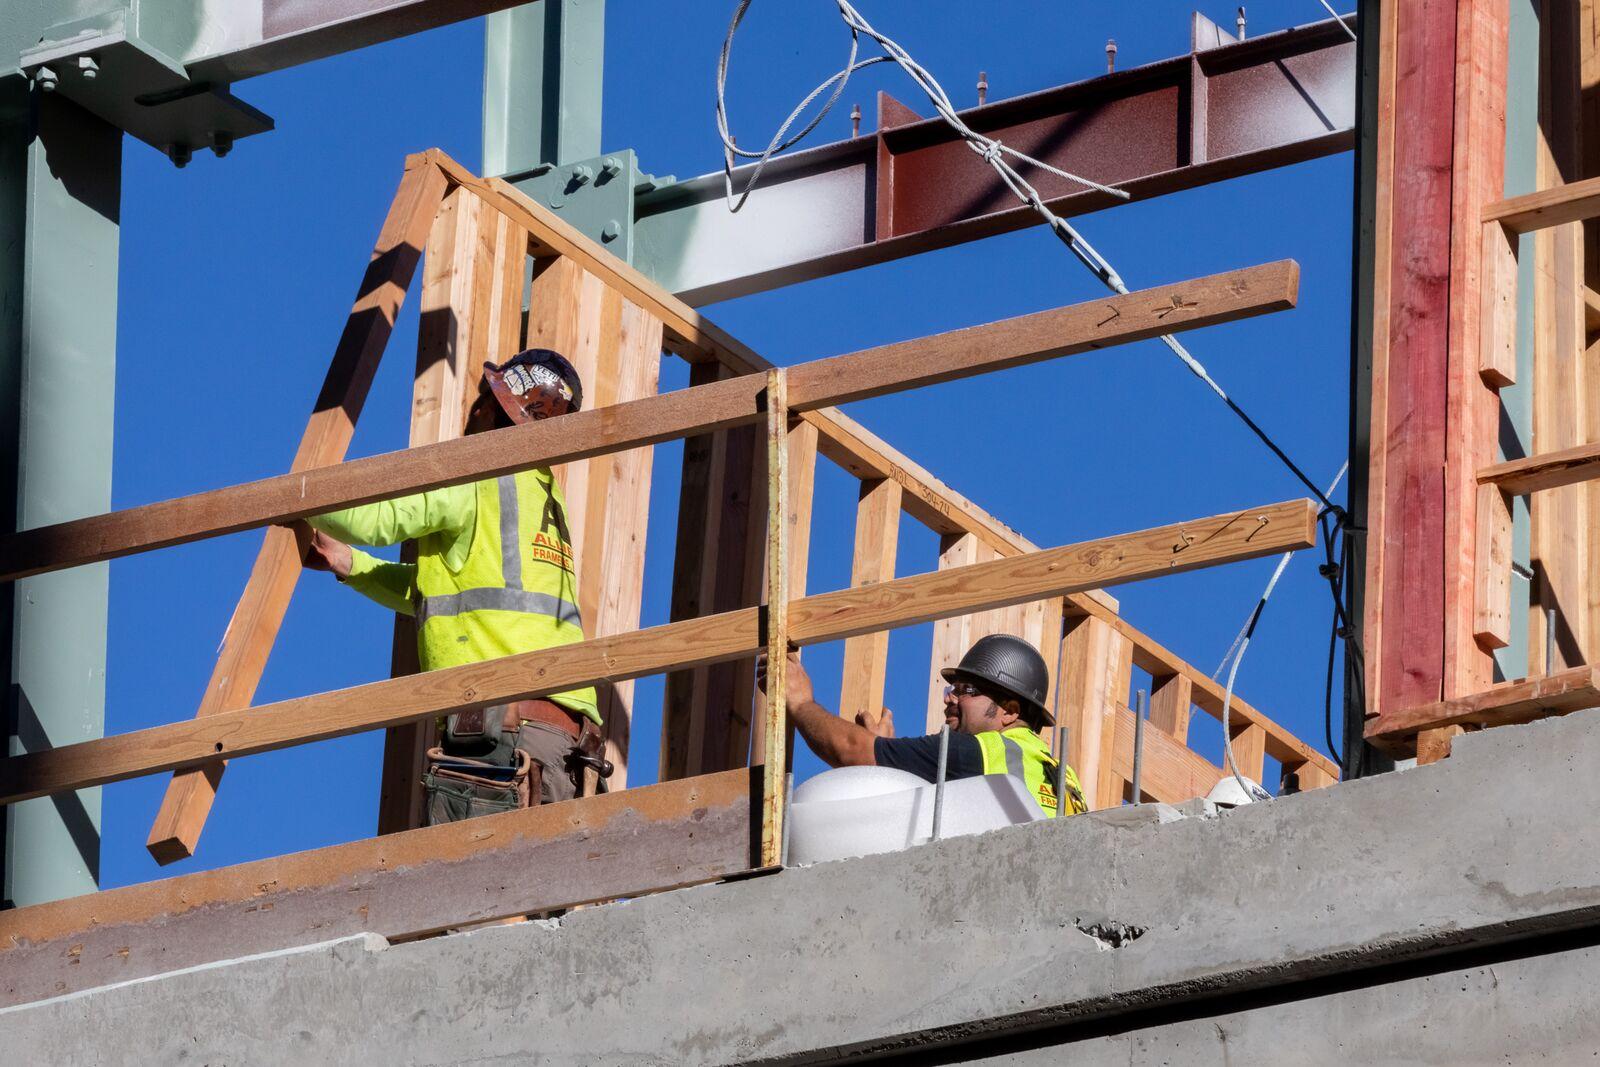 Downtown Berkeley construction as seen on October 1, 2021. Credit: Kelly Sullivan